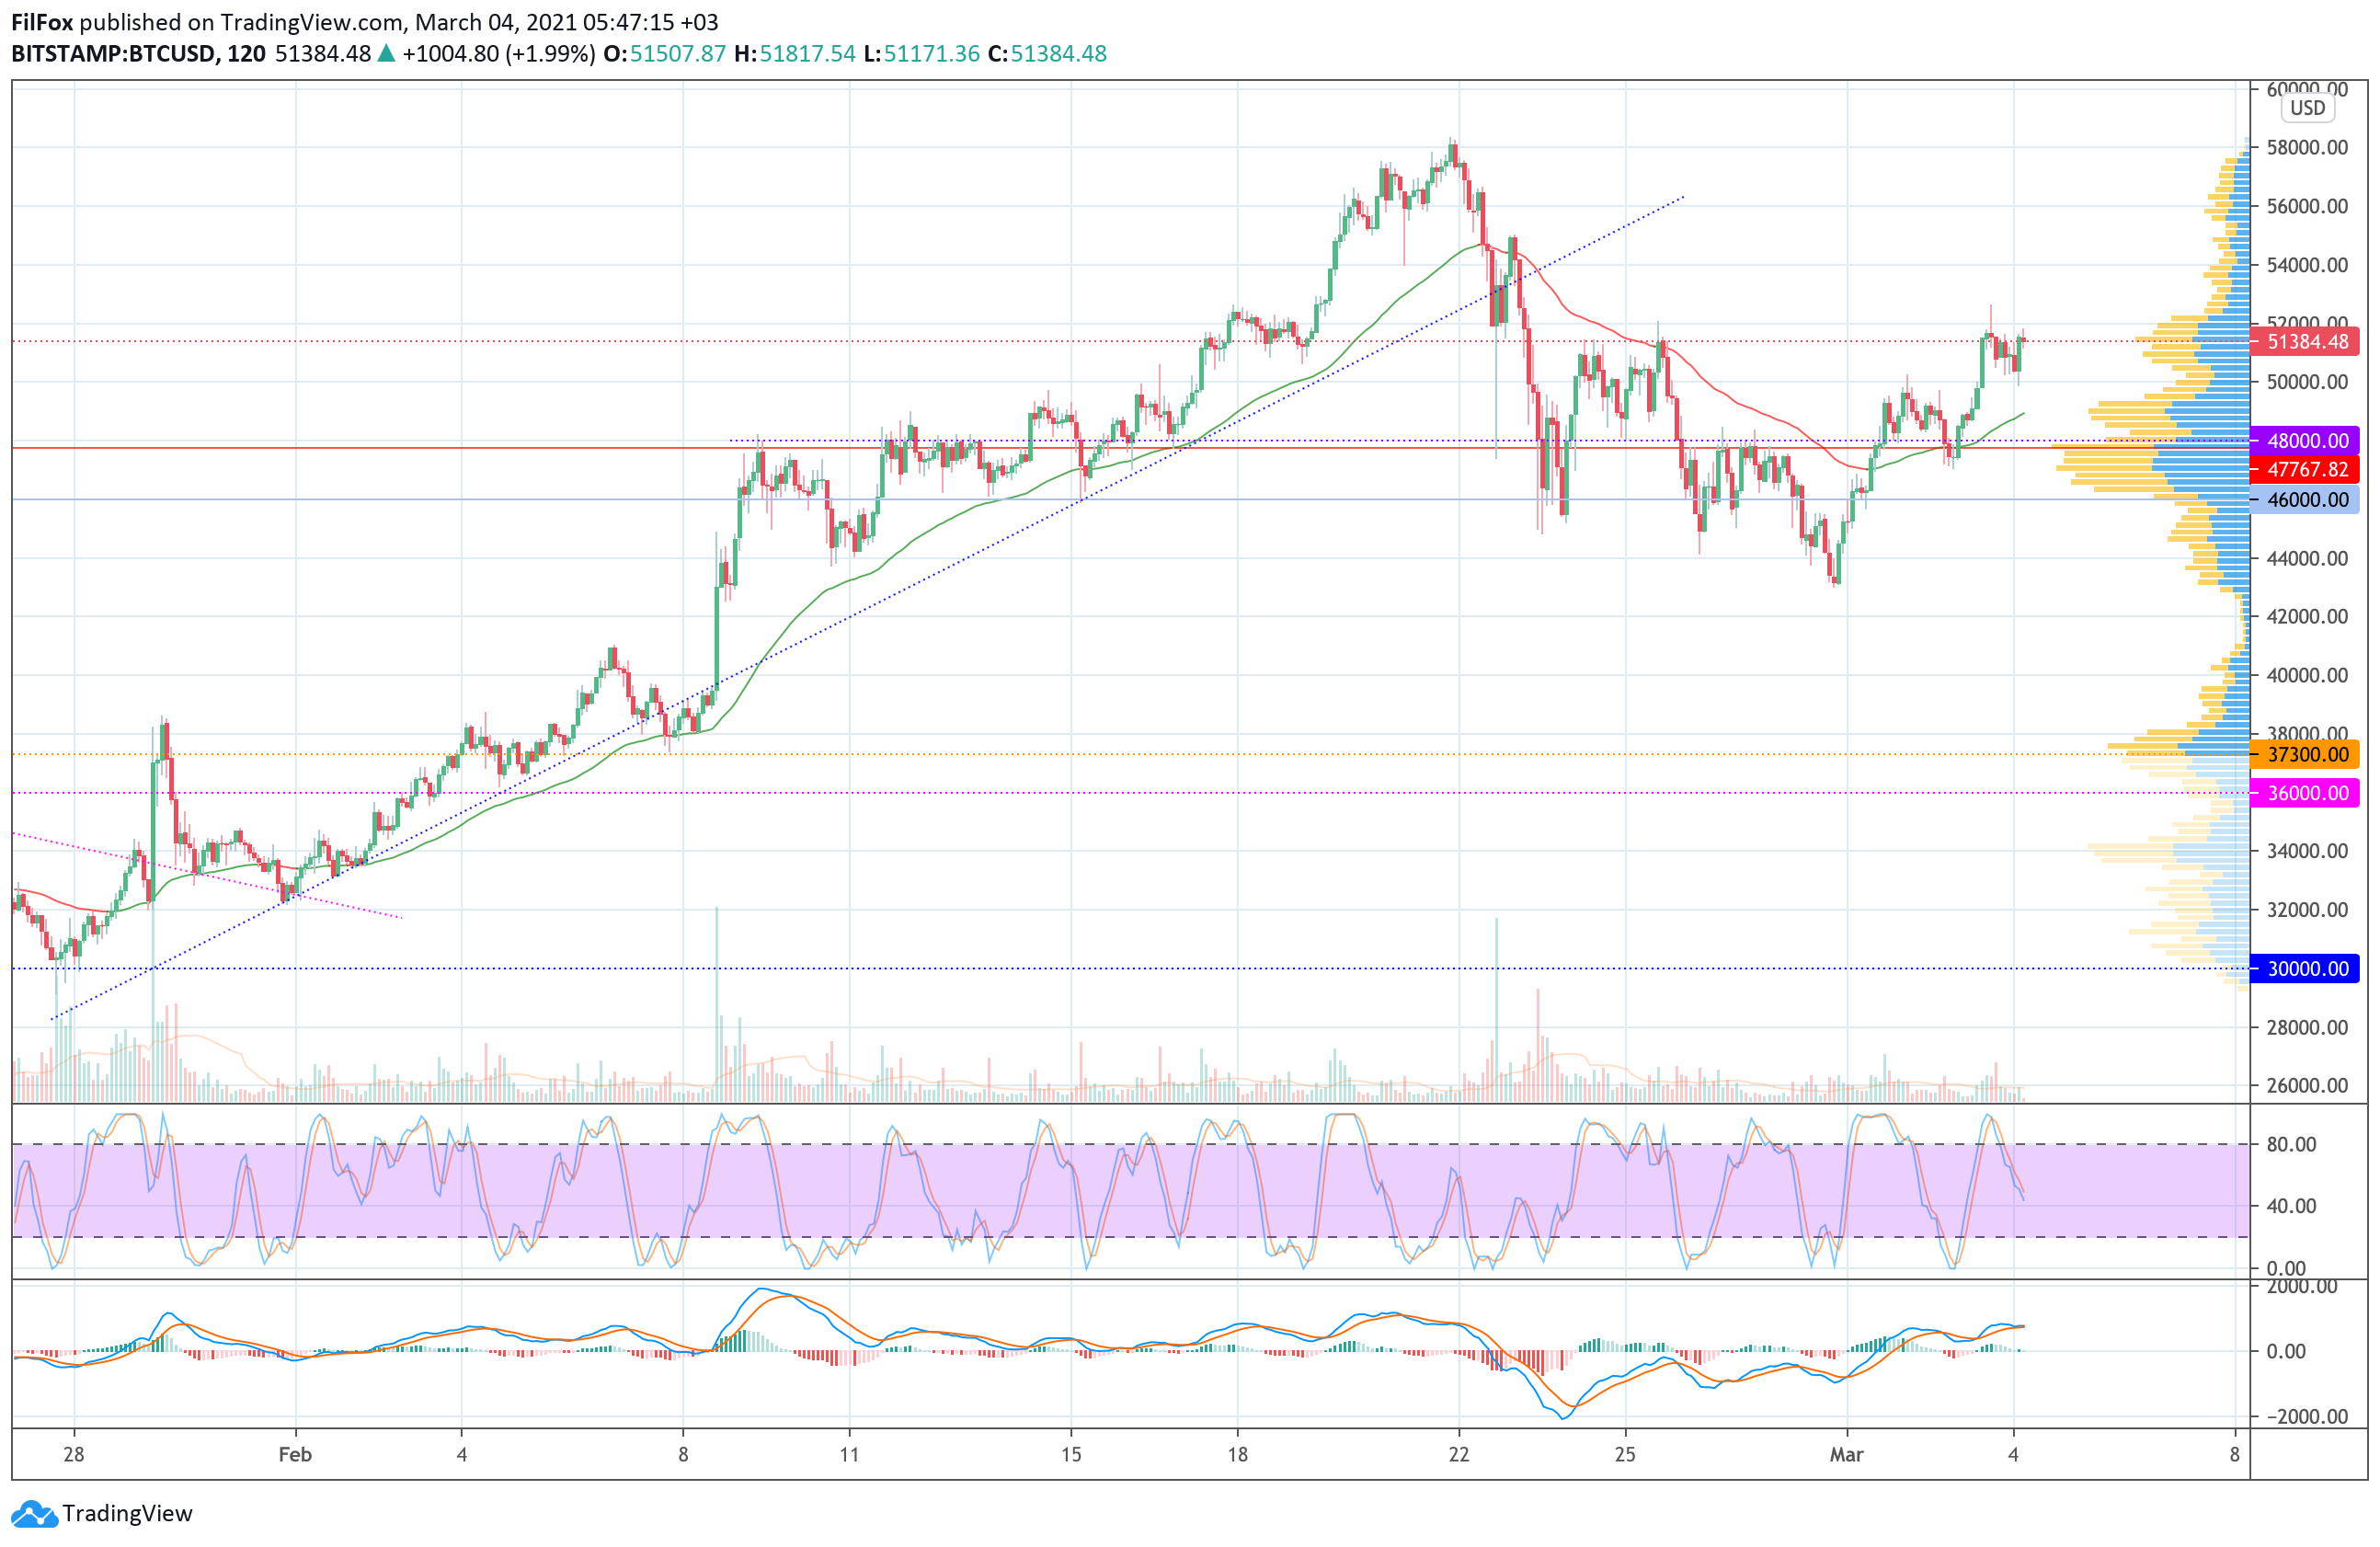 Анализ цен Bitcoin, Ethereum, XRP на 04.03.2021